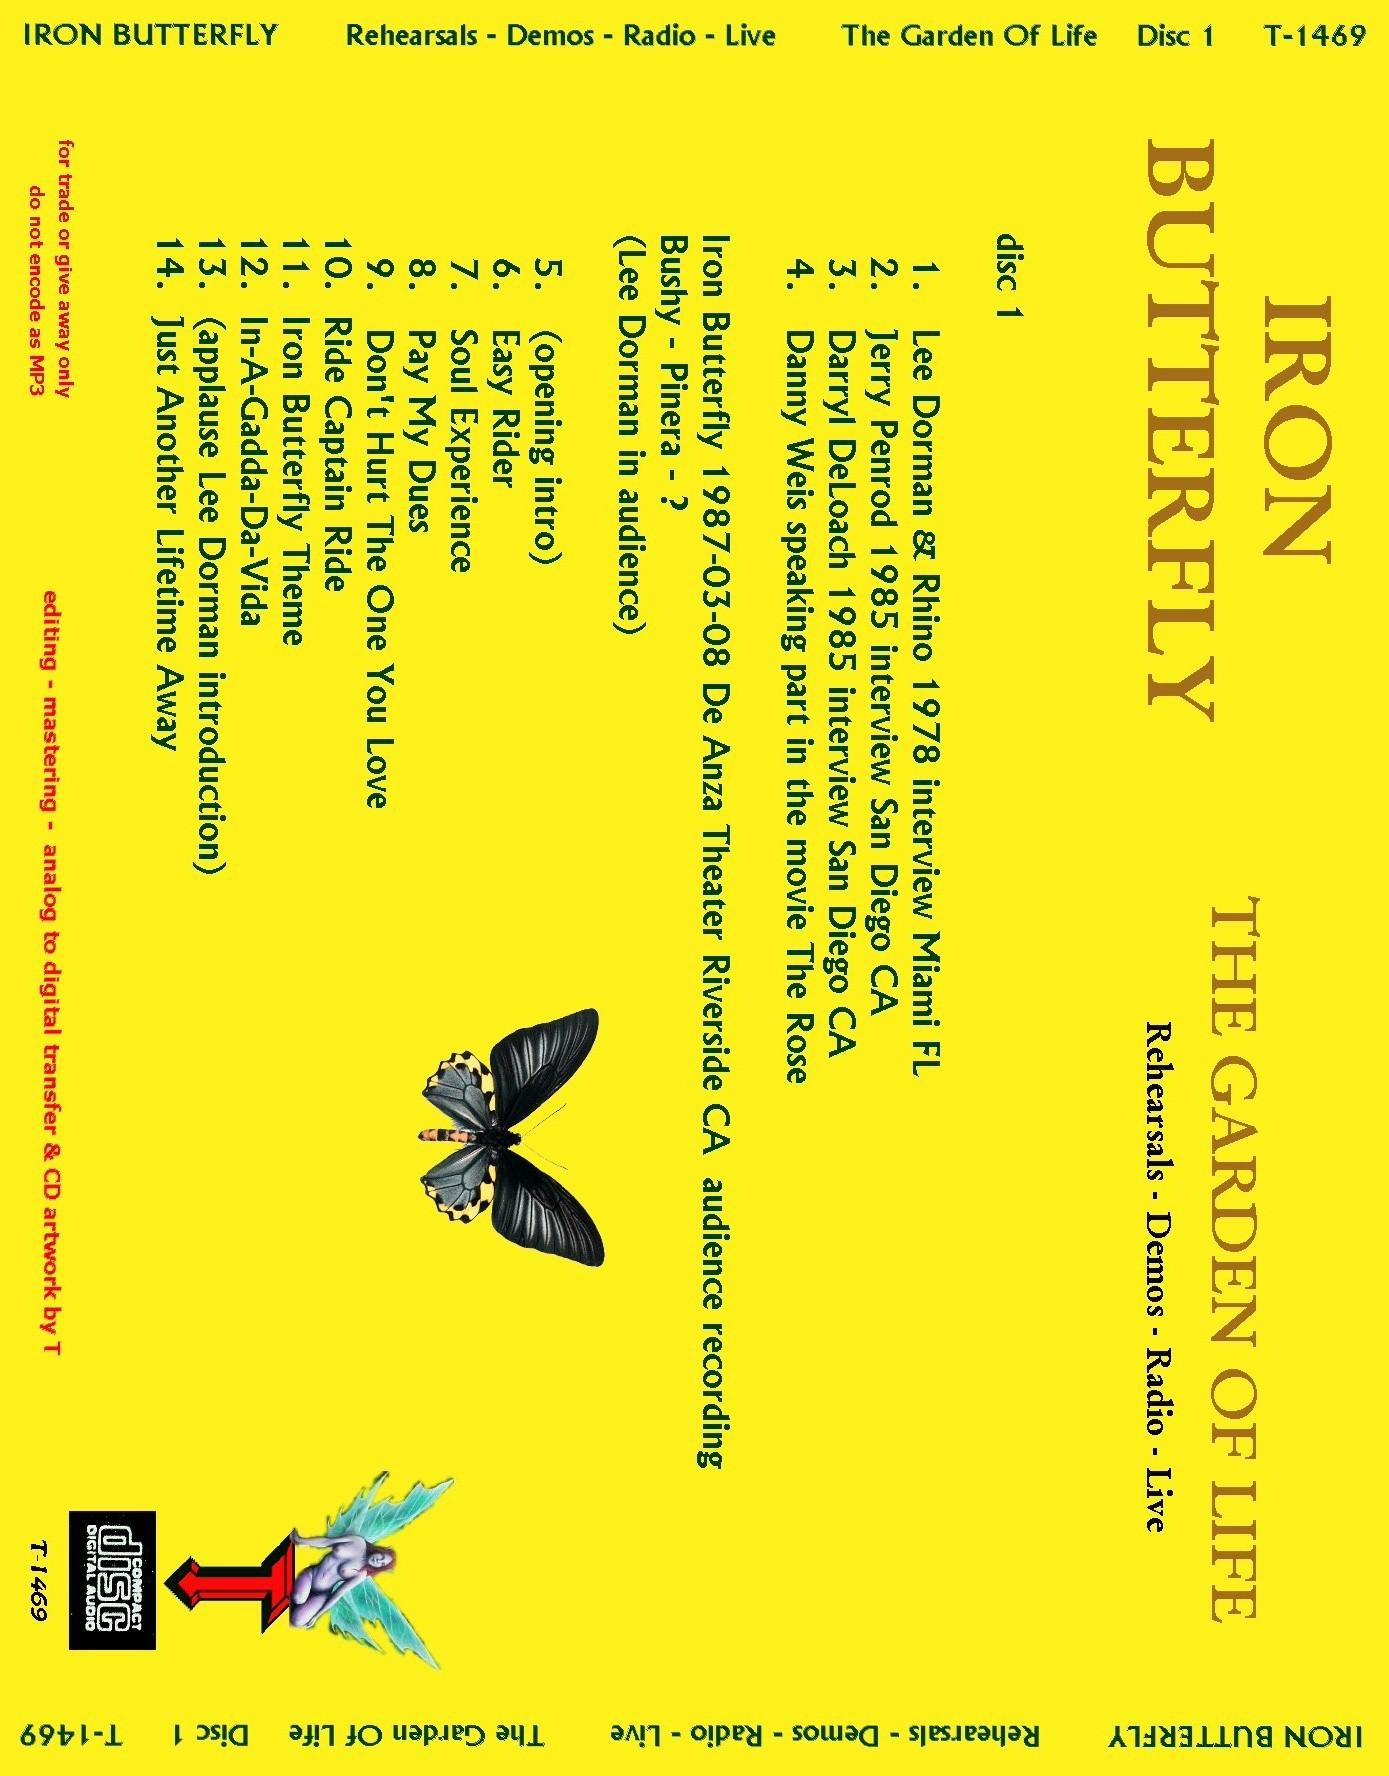 IronButterflyTheGardenOfLifeRehearsalsDemosRadioLive_pt1.JPG